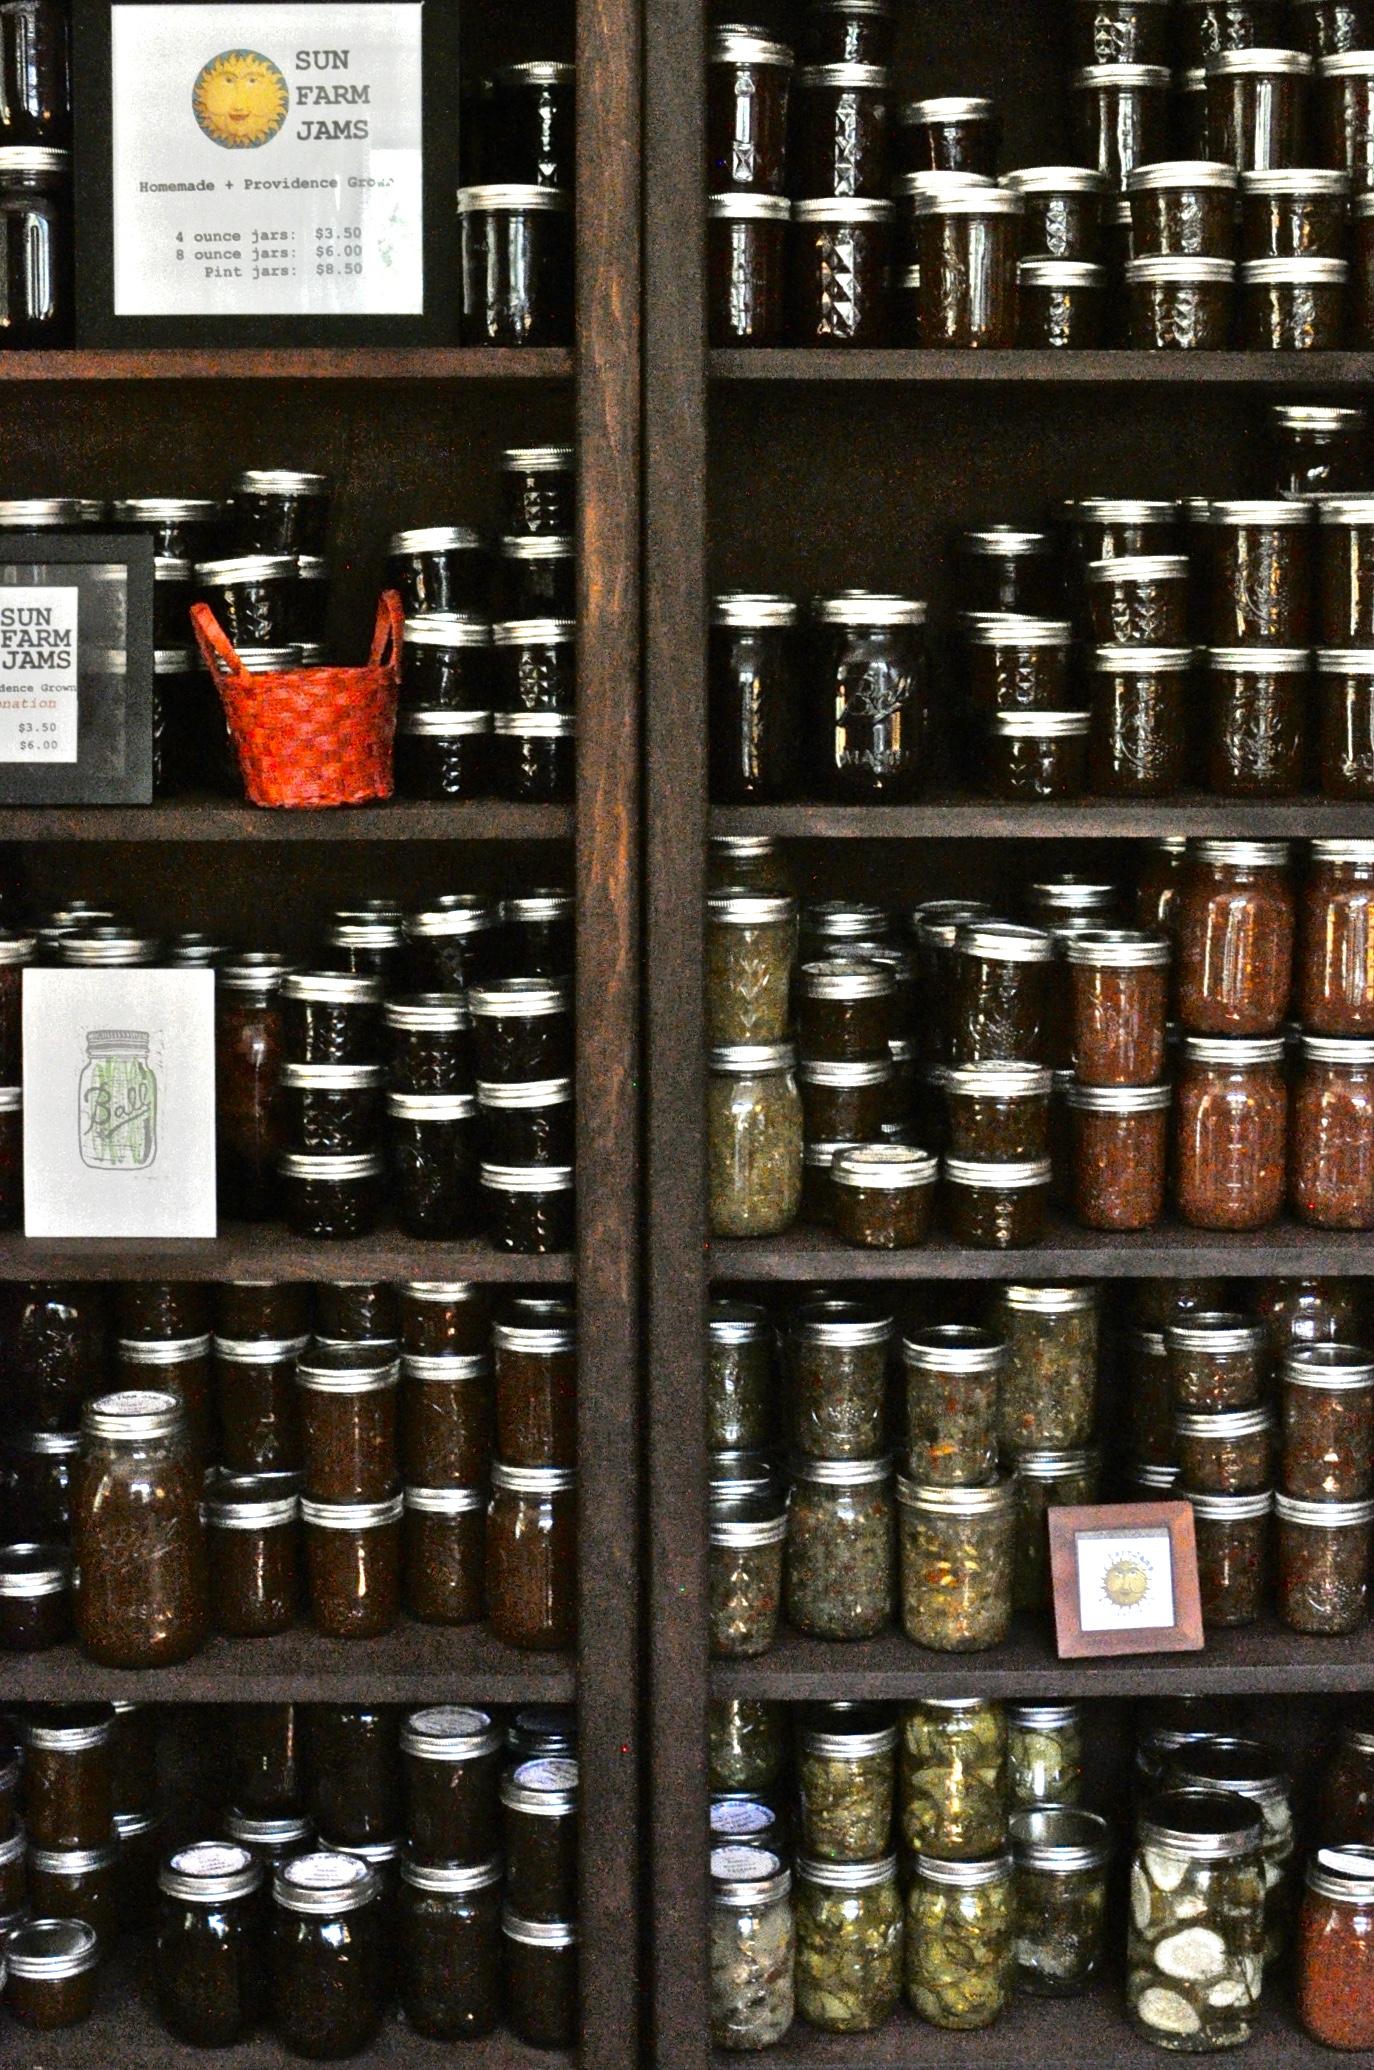 Sun Farm Jams, made from produce grown in the maker's Hammond Street garden Photo by Barbra Revill